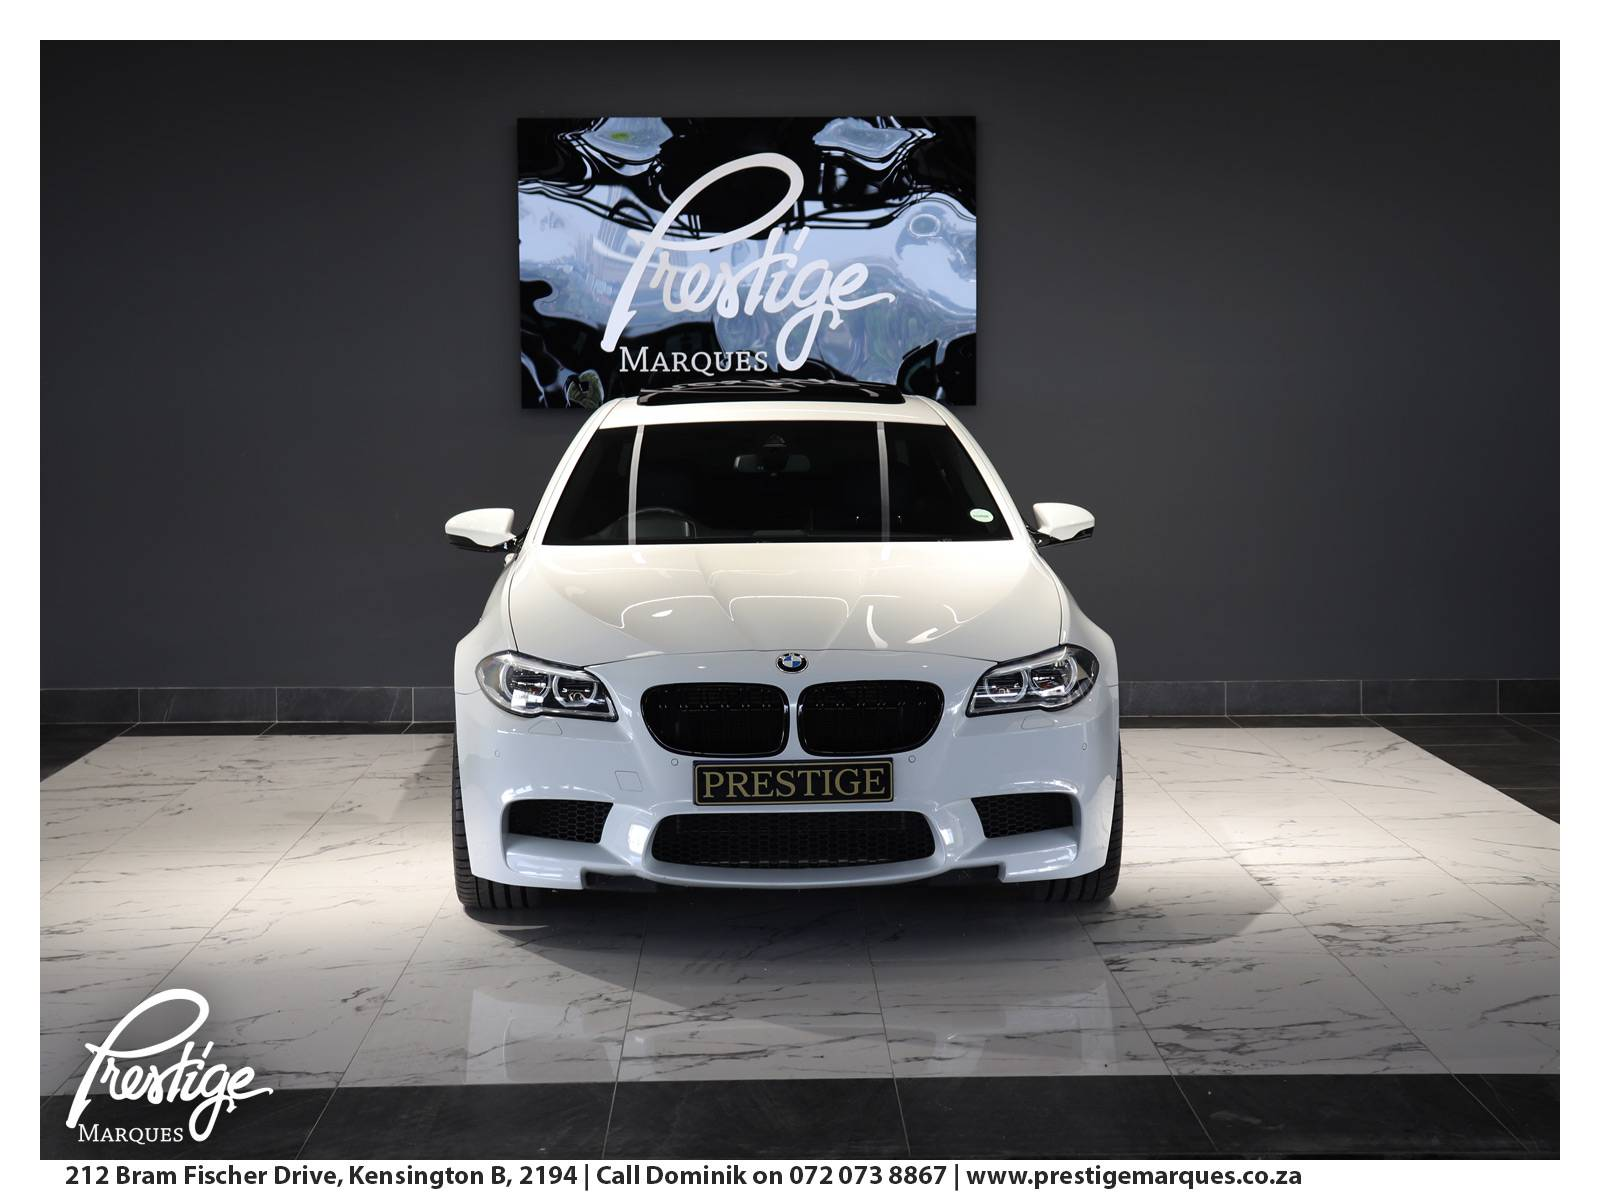 2015-BMW-F10-M5-MDCT-Prestige-Marques-Randburg-Sandton-7